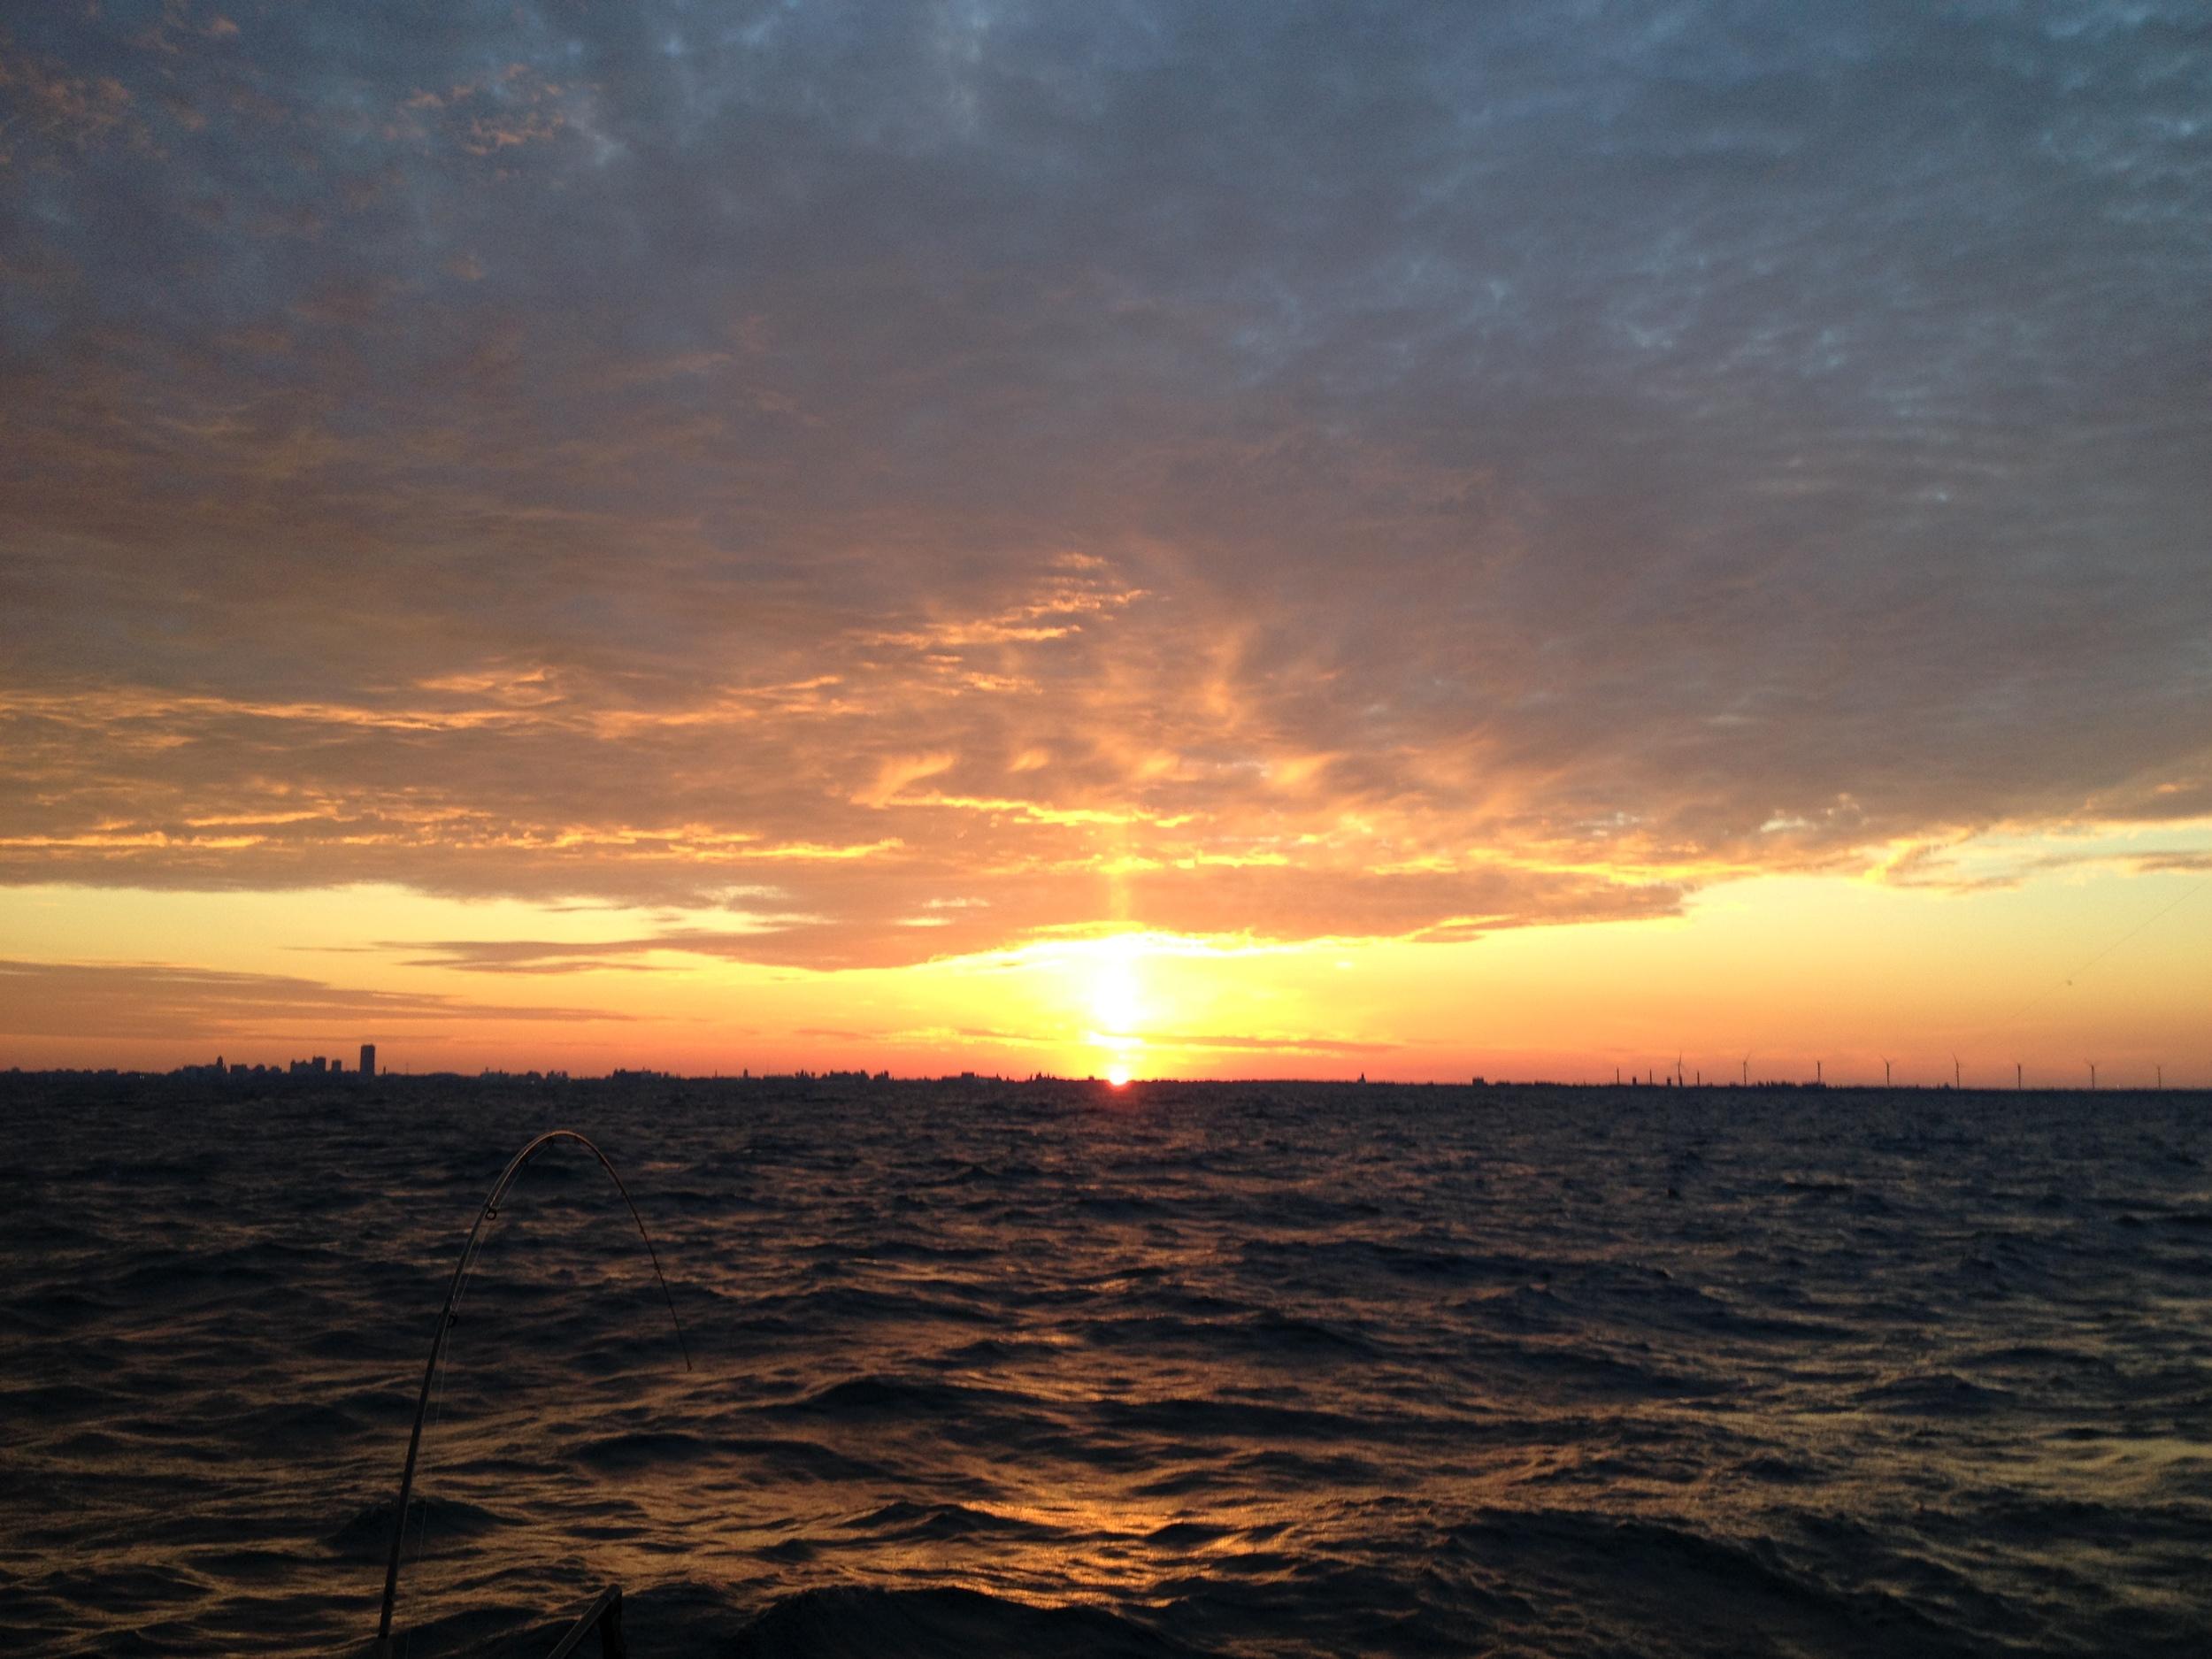 Sunrise over Buffalo - (c) 2014 Steel Leader Guide Services, LLC